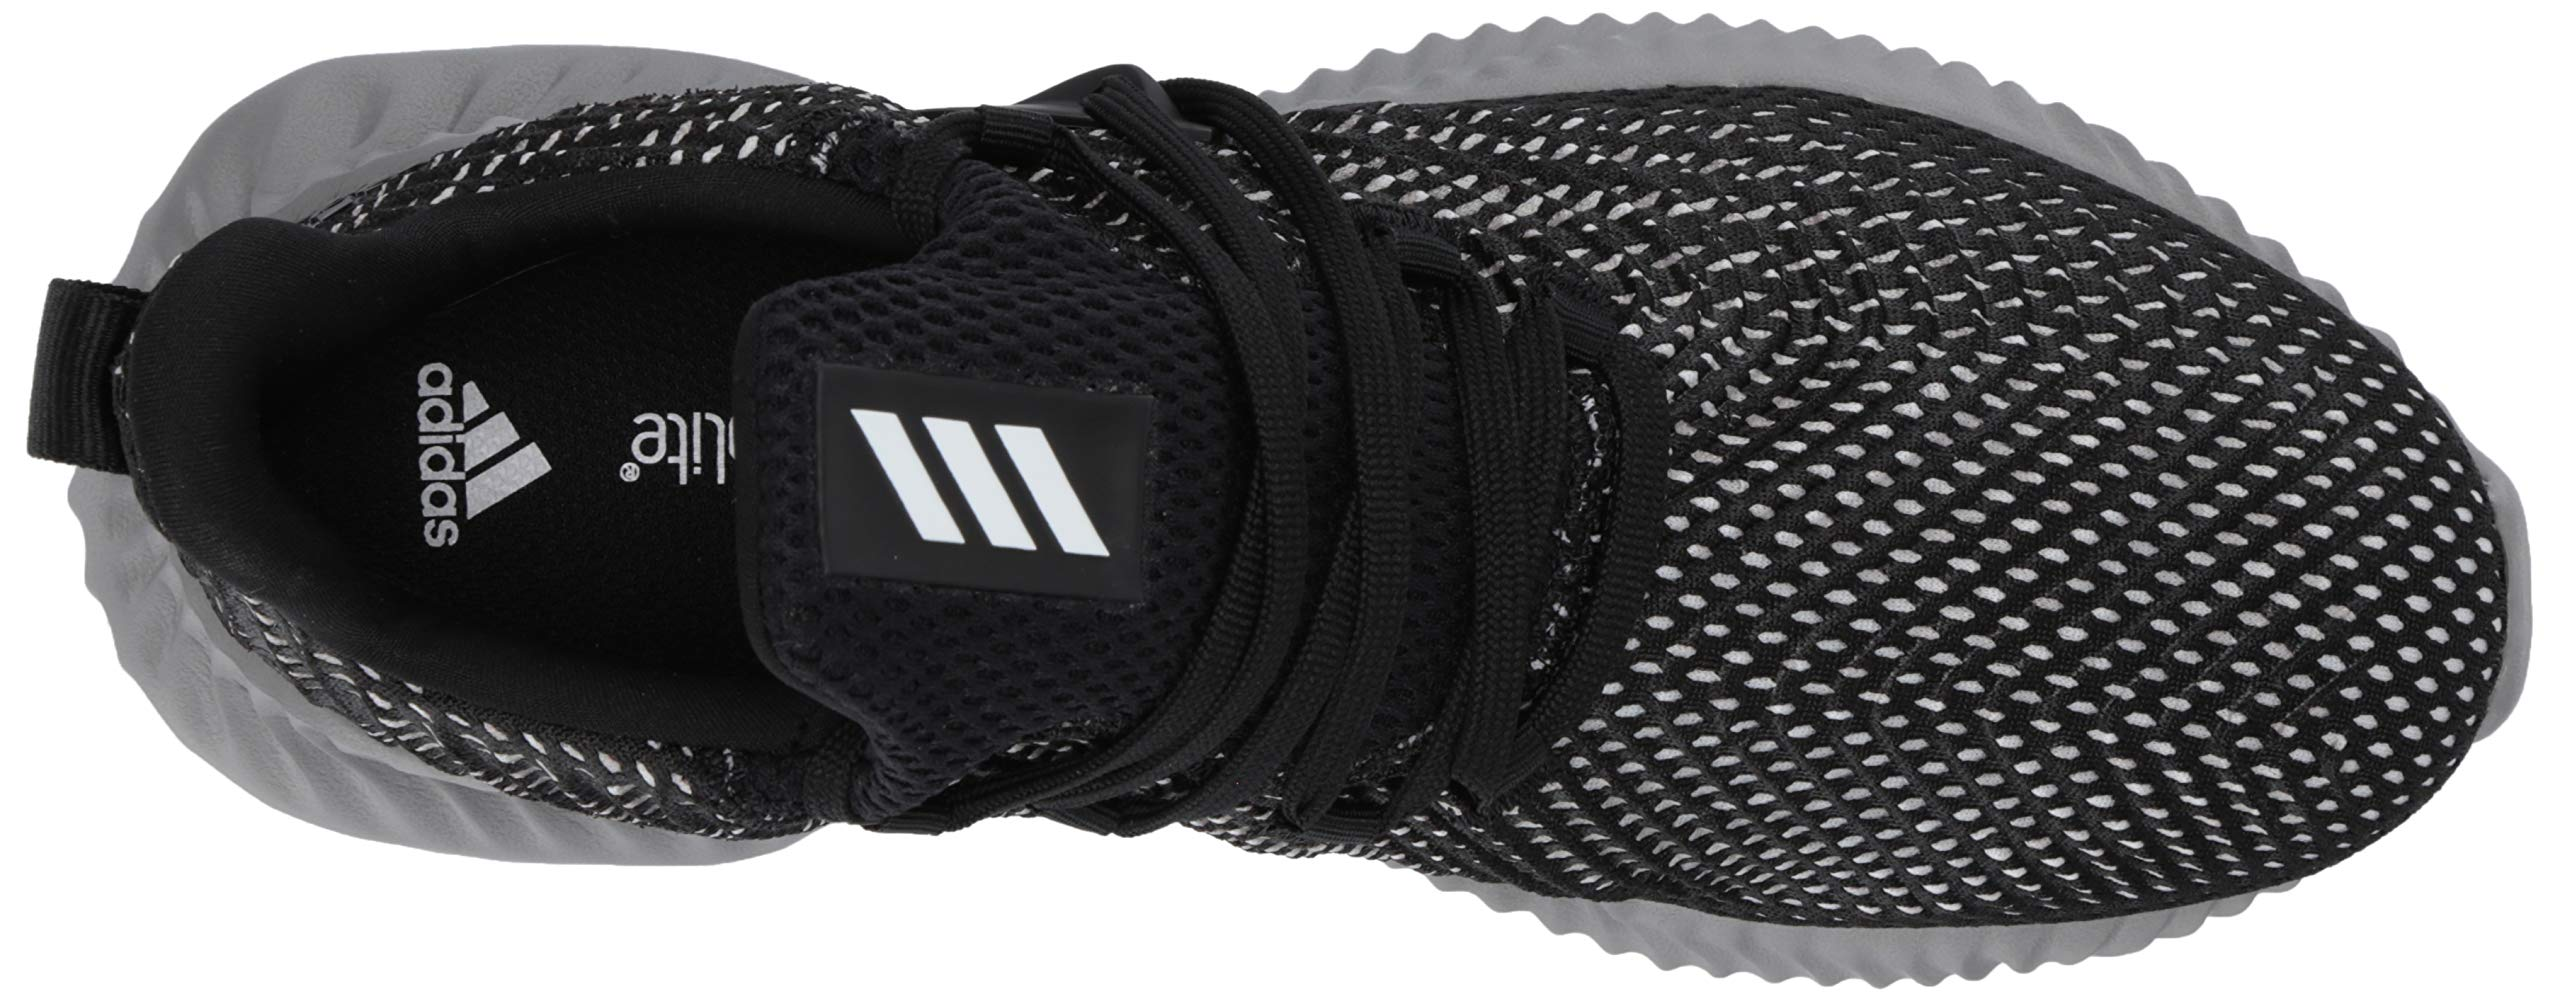 Adidas Kids Alphabounce Instinct, Black/White/Grey, 1 M US Little Kid by adidas (Image #8)